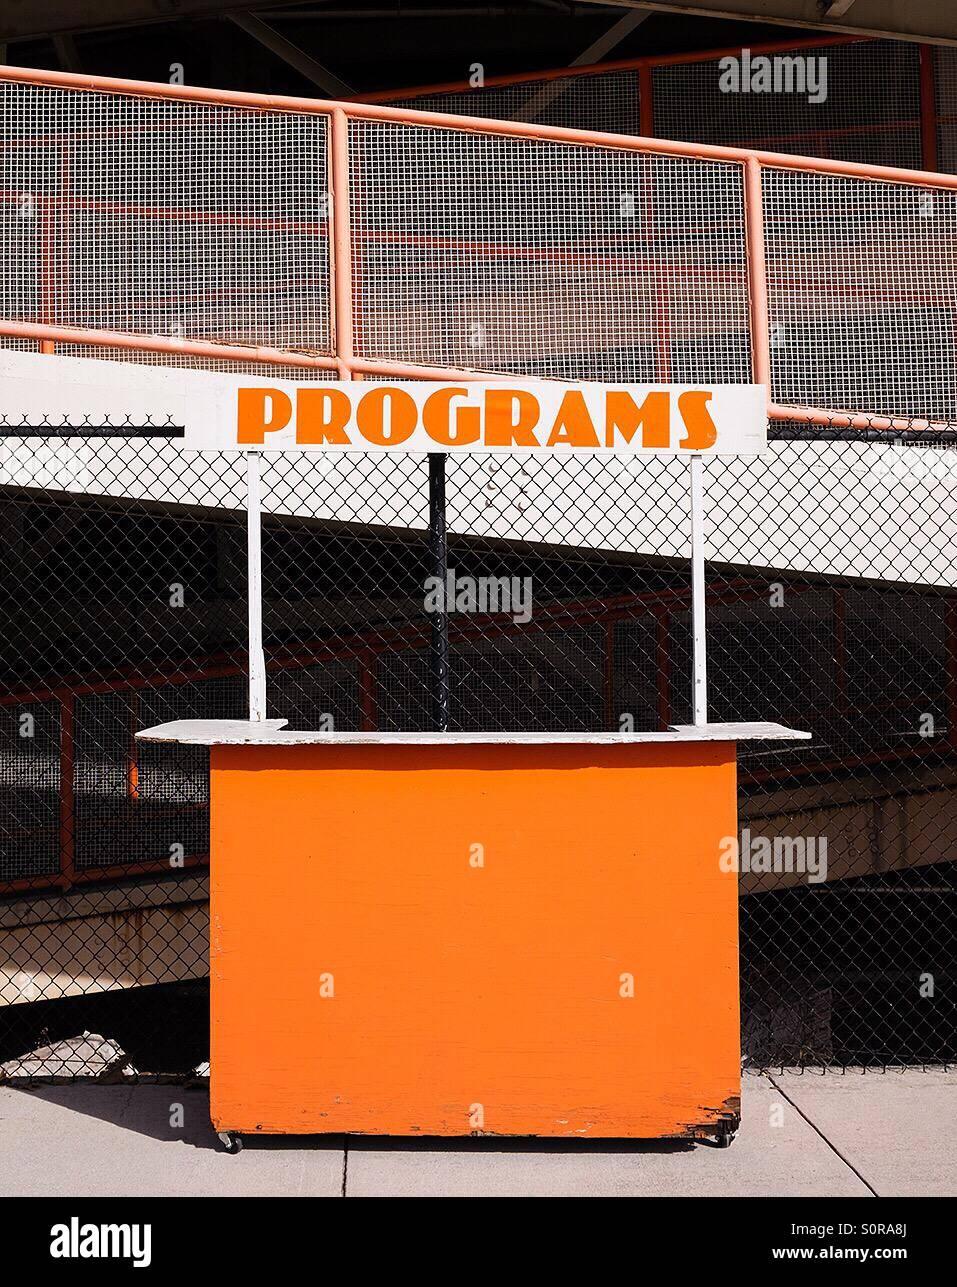 Programs - Stock Image